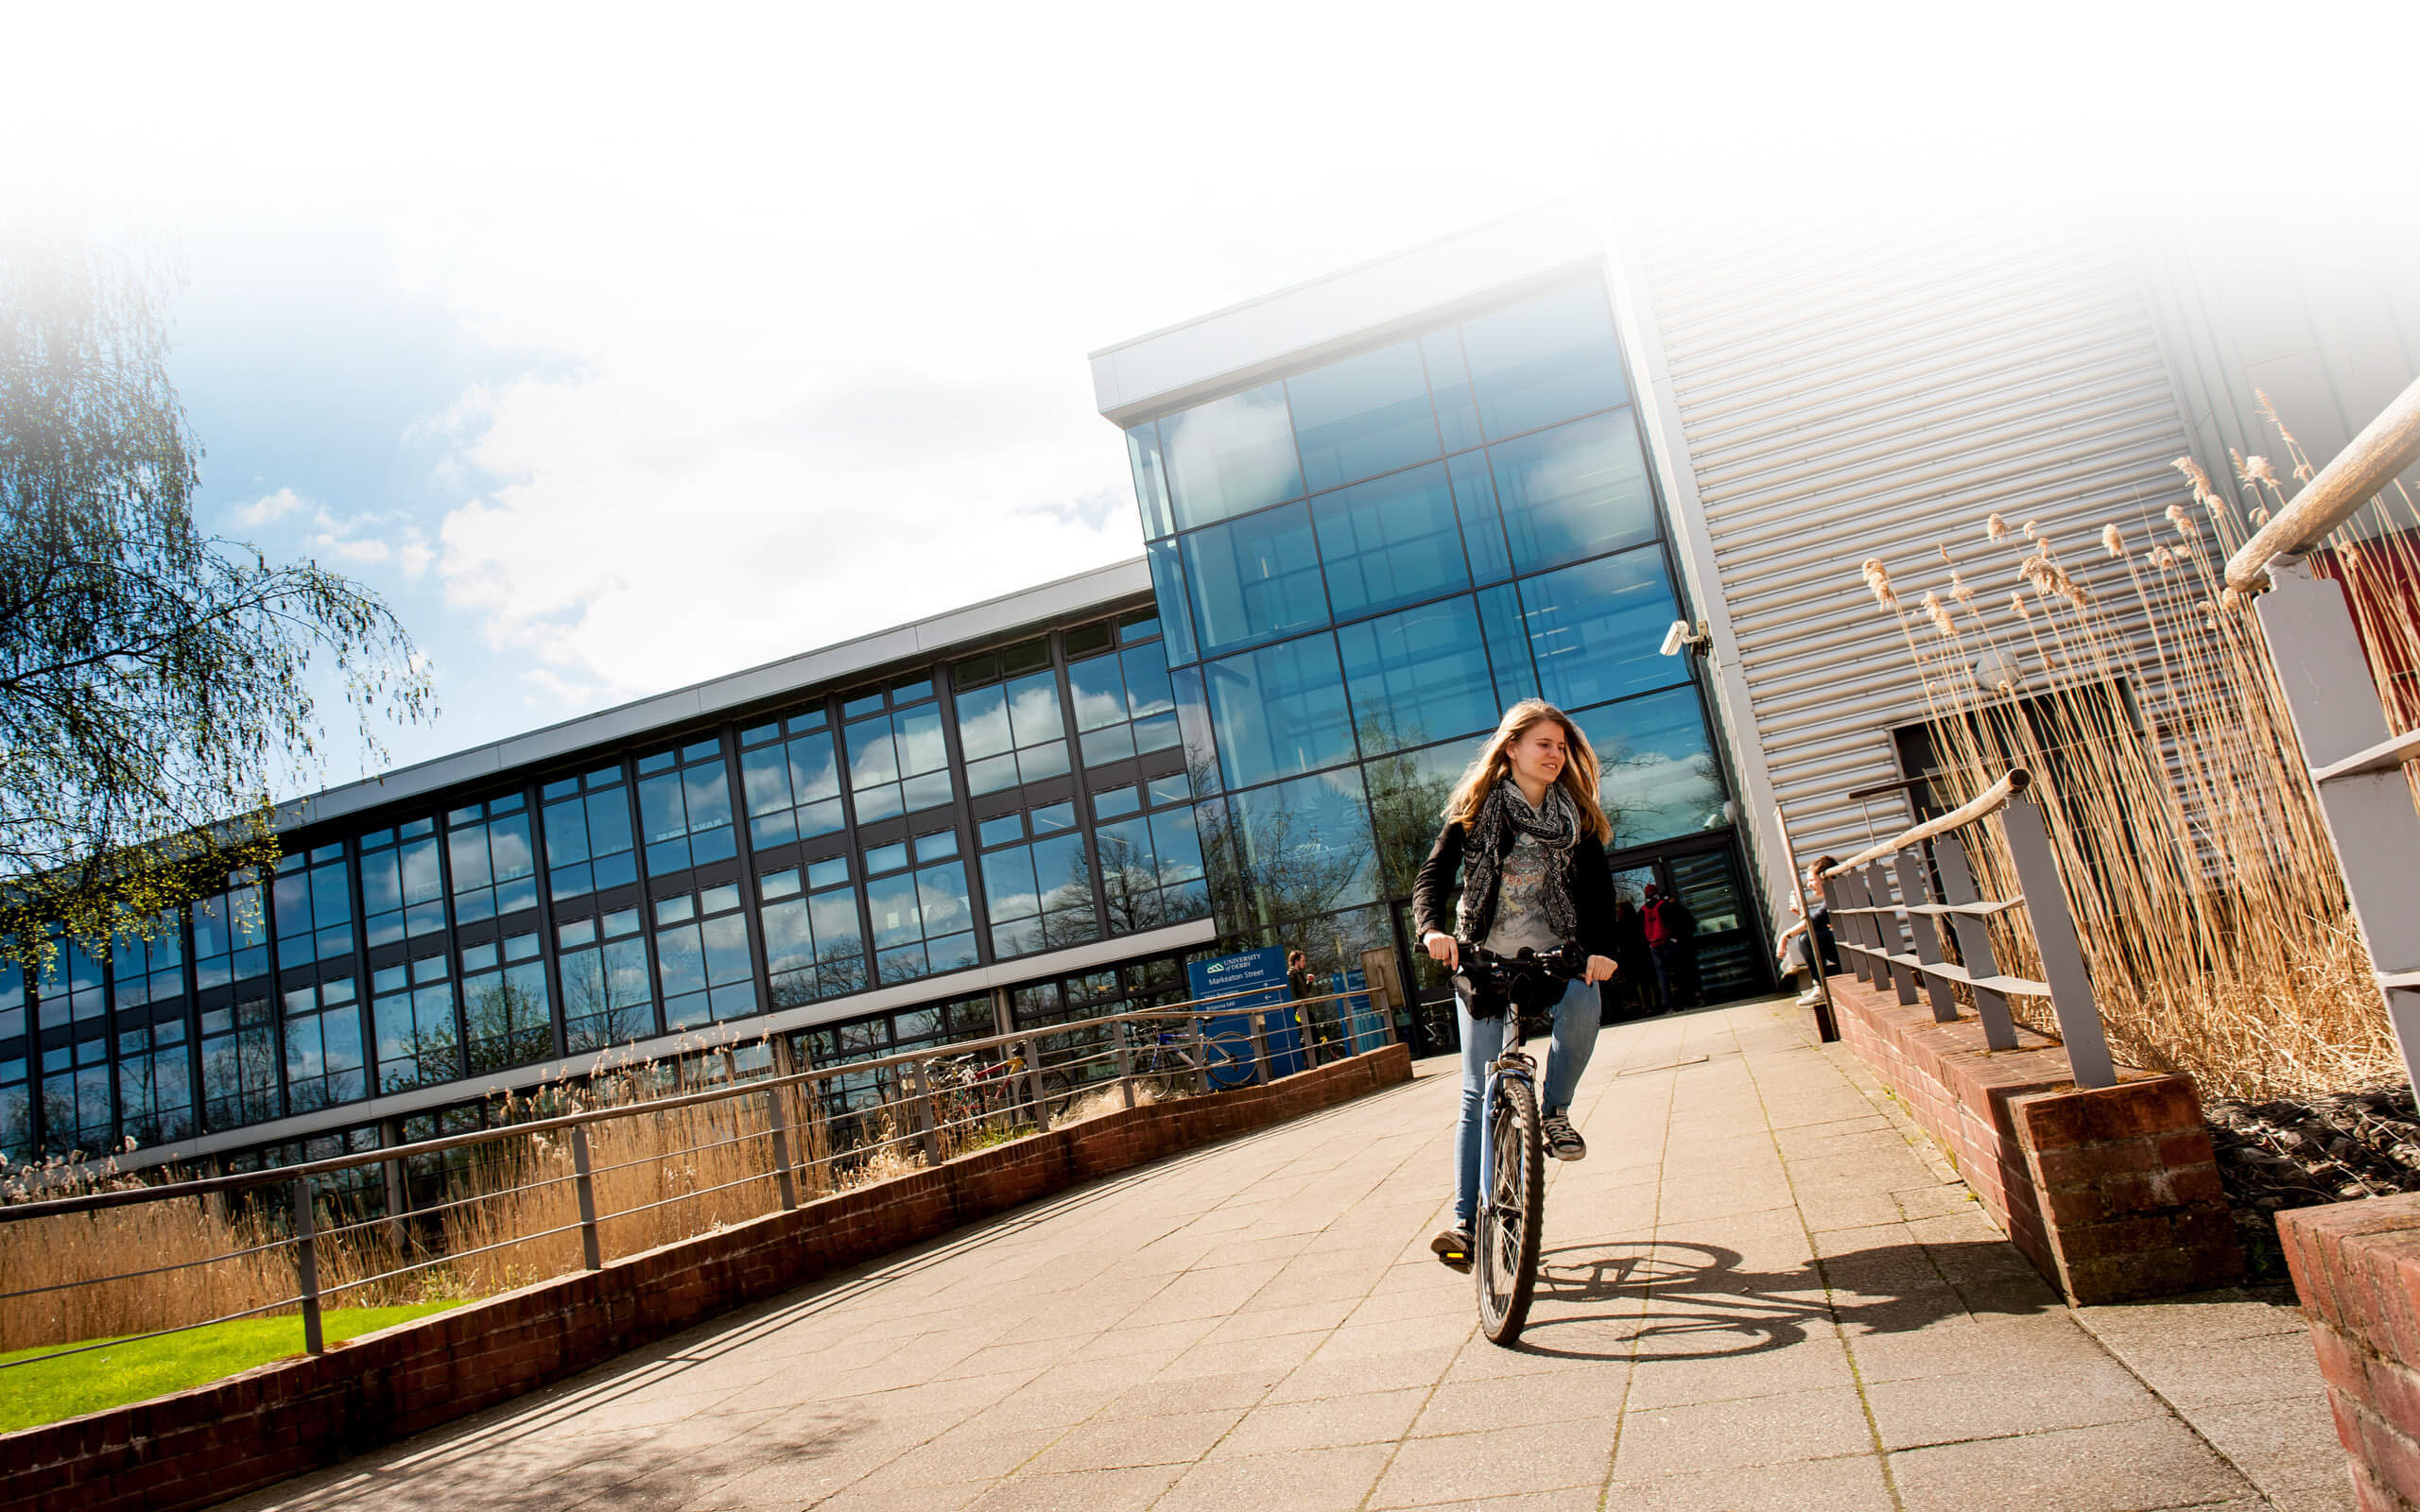 A female student riding a bike at Kedleston Road